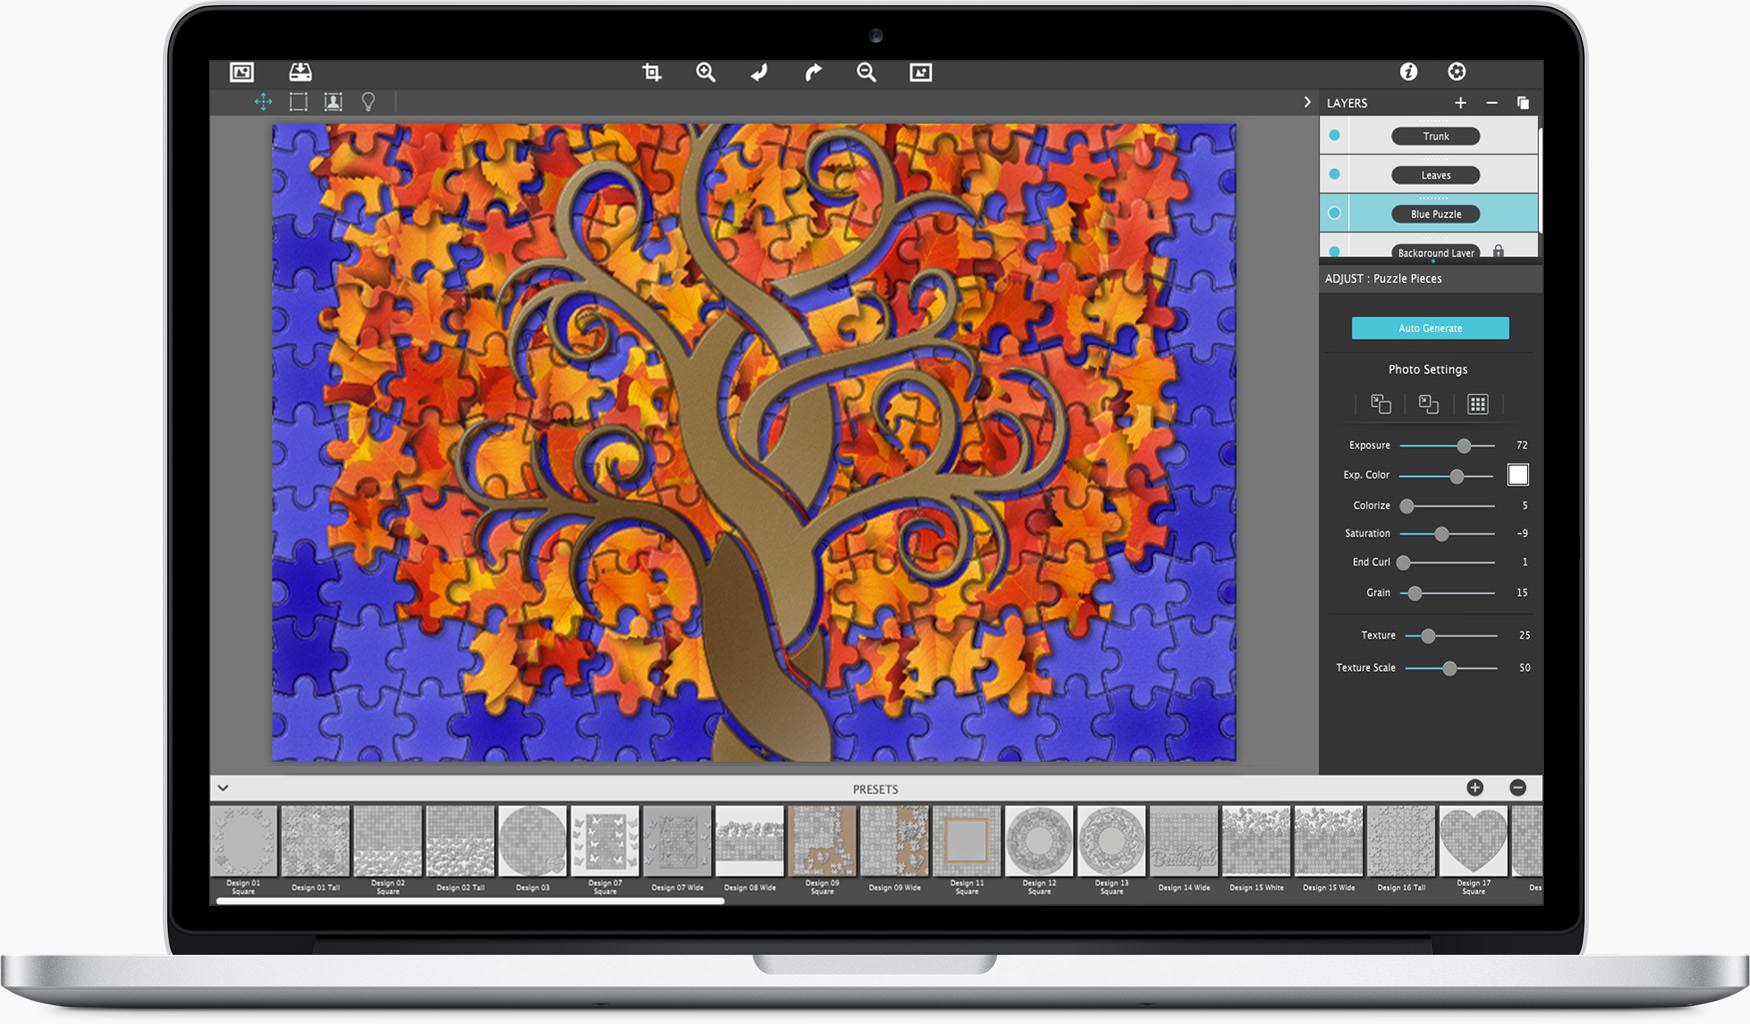 JixiPix PuzziPix Pro 1.0.14 Mac 破解版 专业图片拼图工具